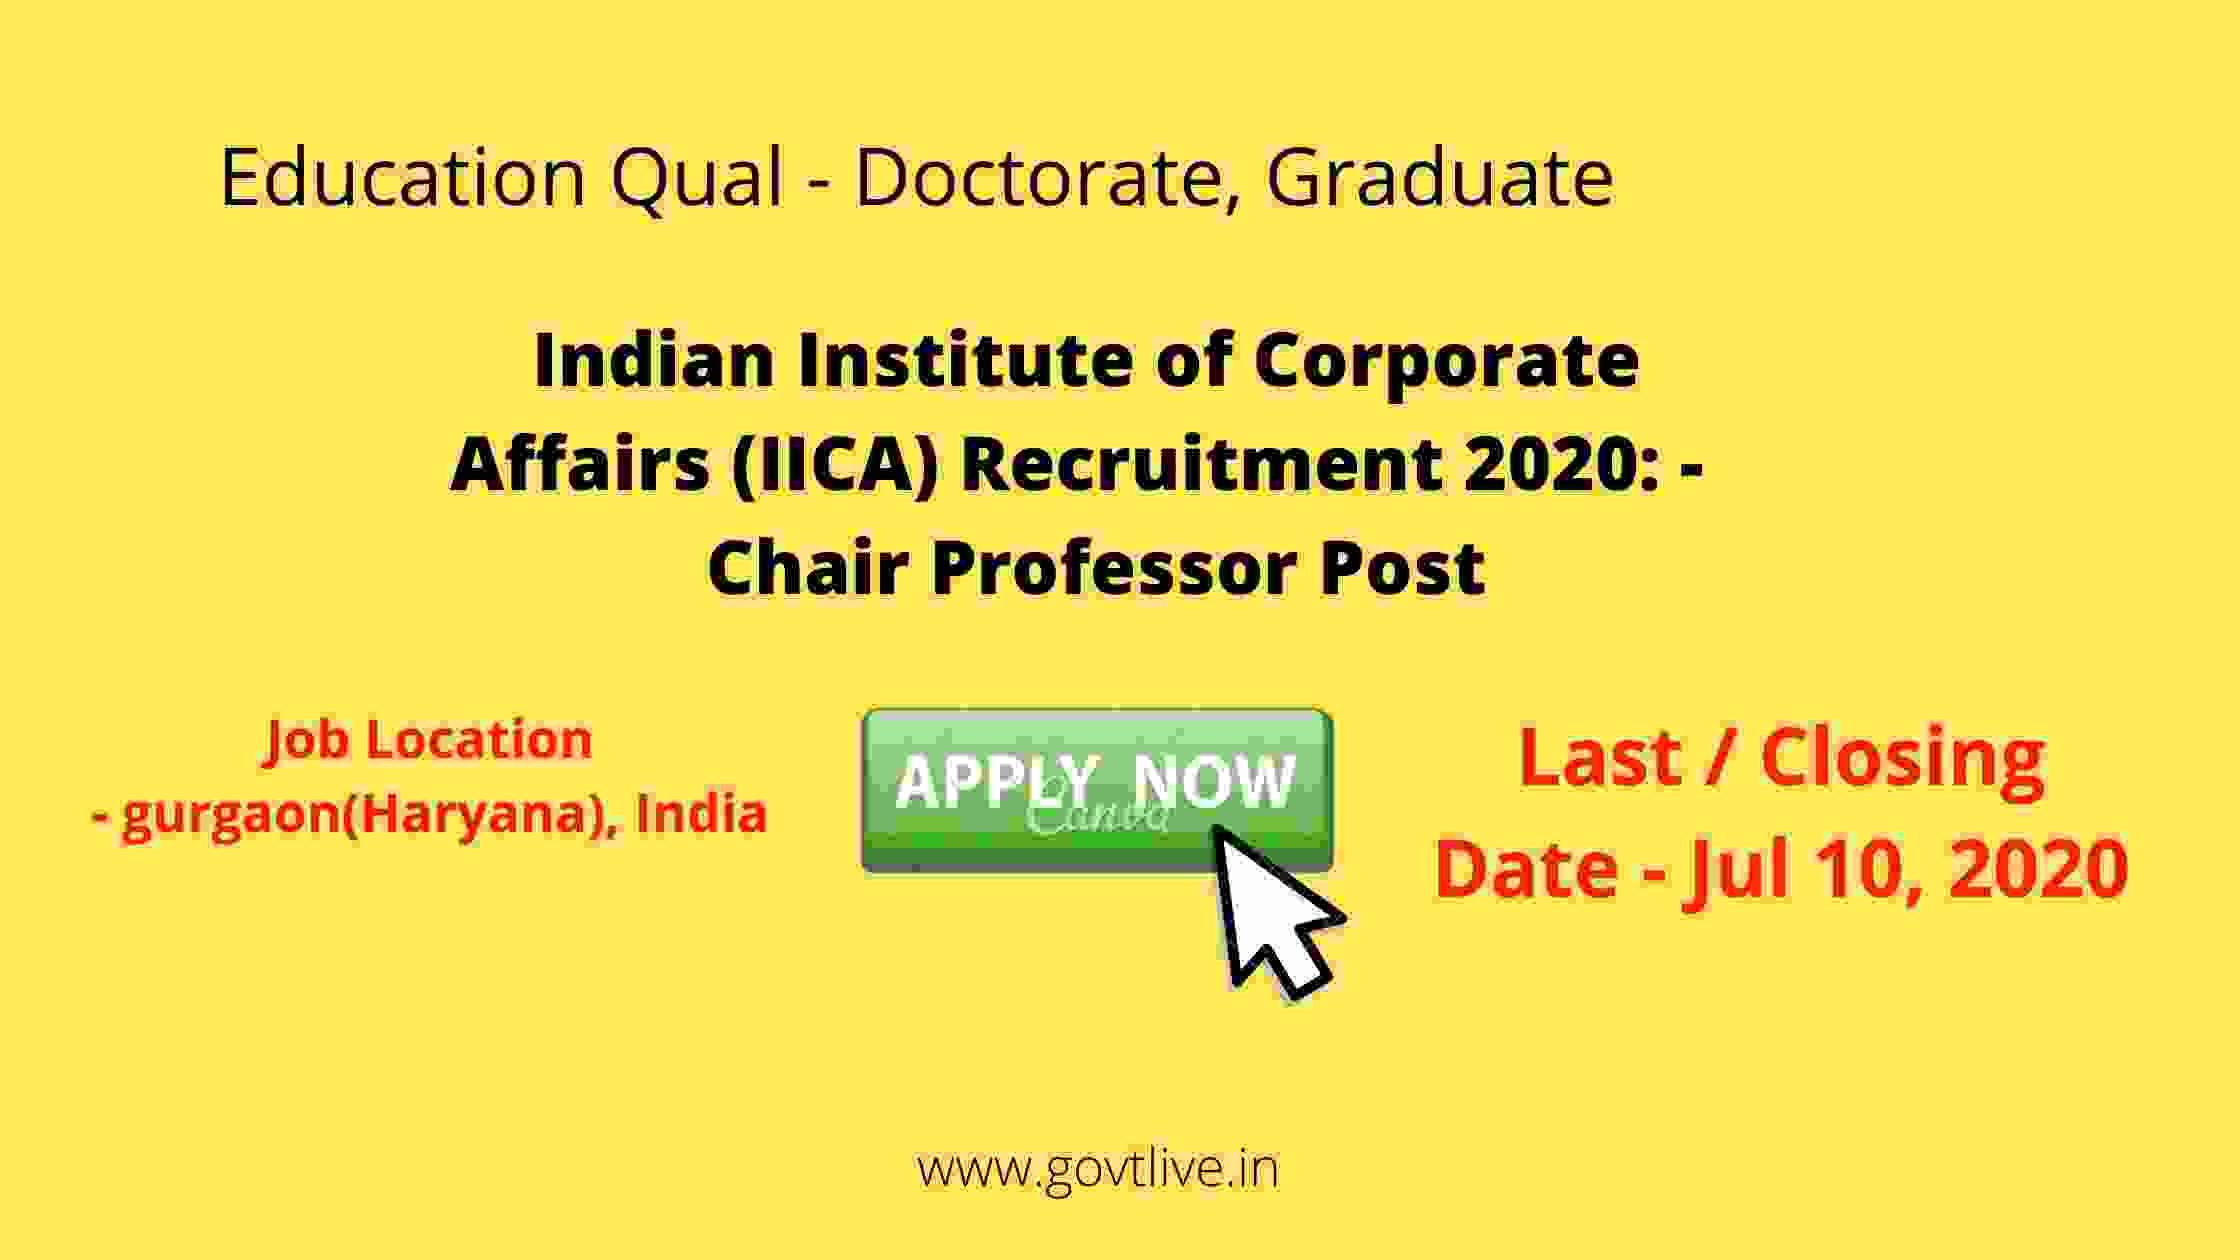 Indian Institute of Corporate Affairs (IICA) Recruitment 2020: -  Chair Professor Post